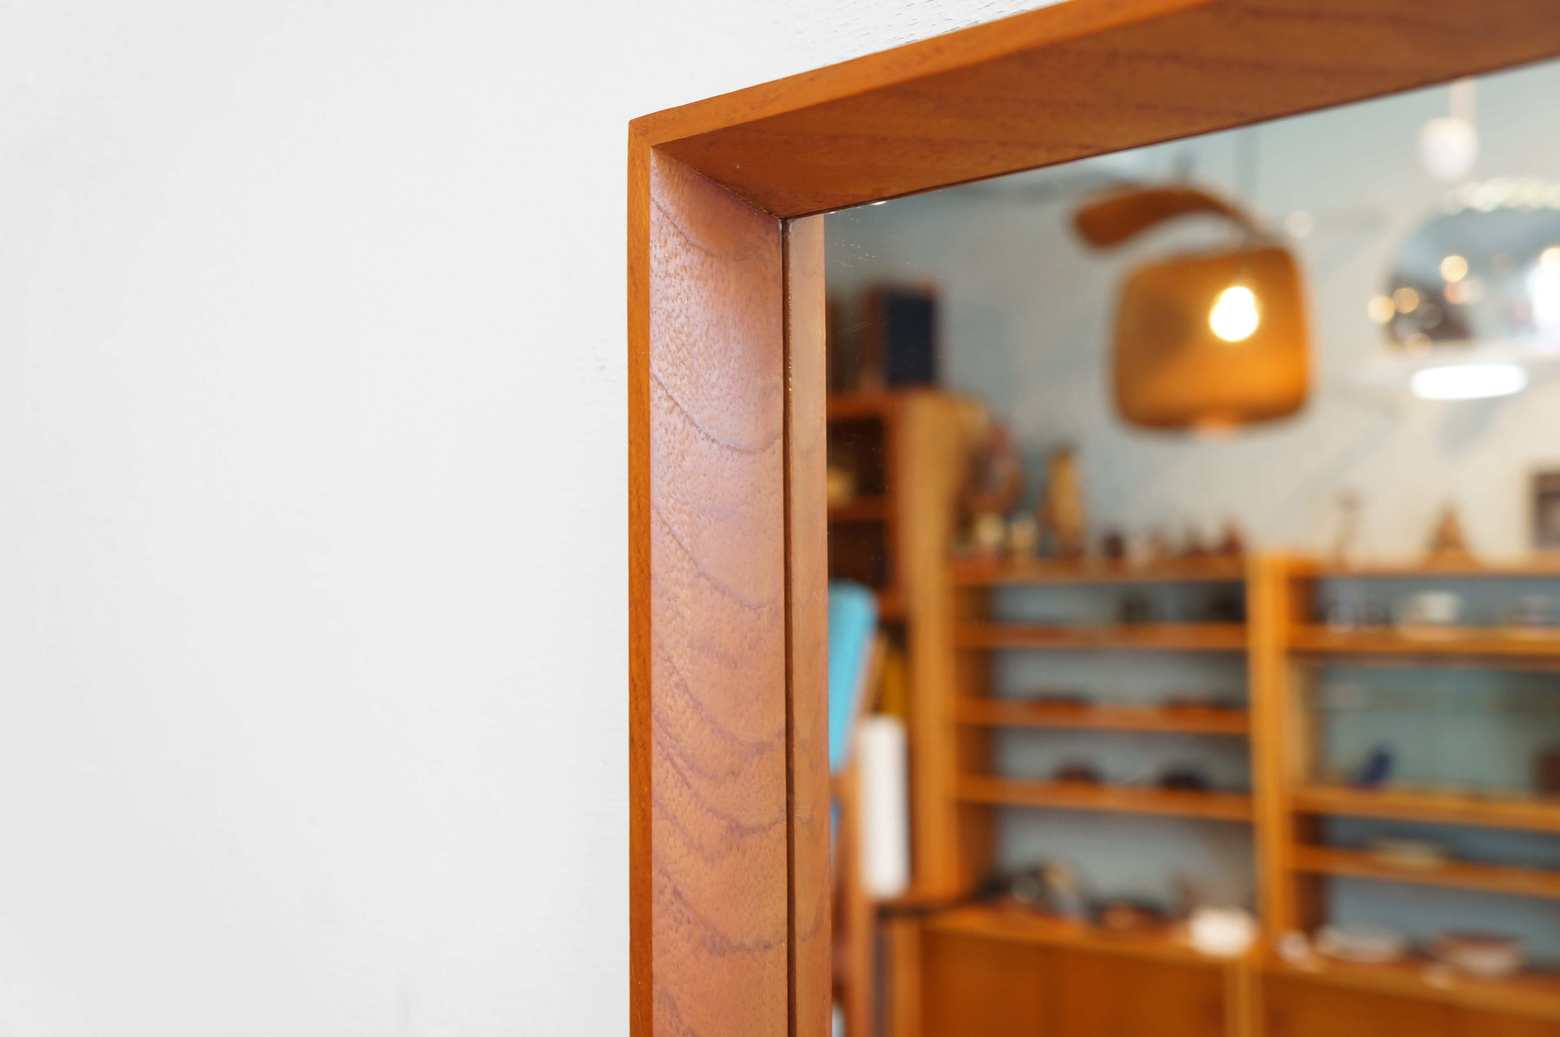 Danish Vintage Teakwood Frame Wall Mirror/デンマーク ヴィンテージ チークフレーム ウォールミラー